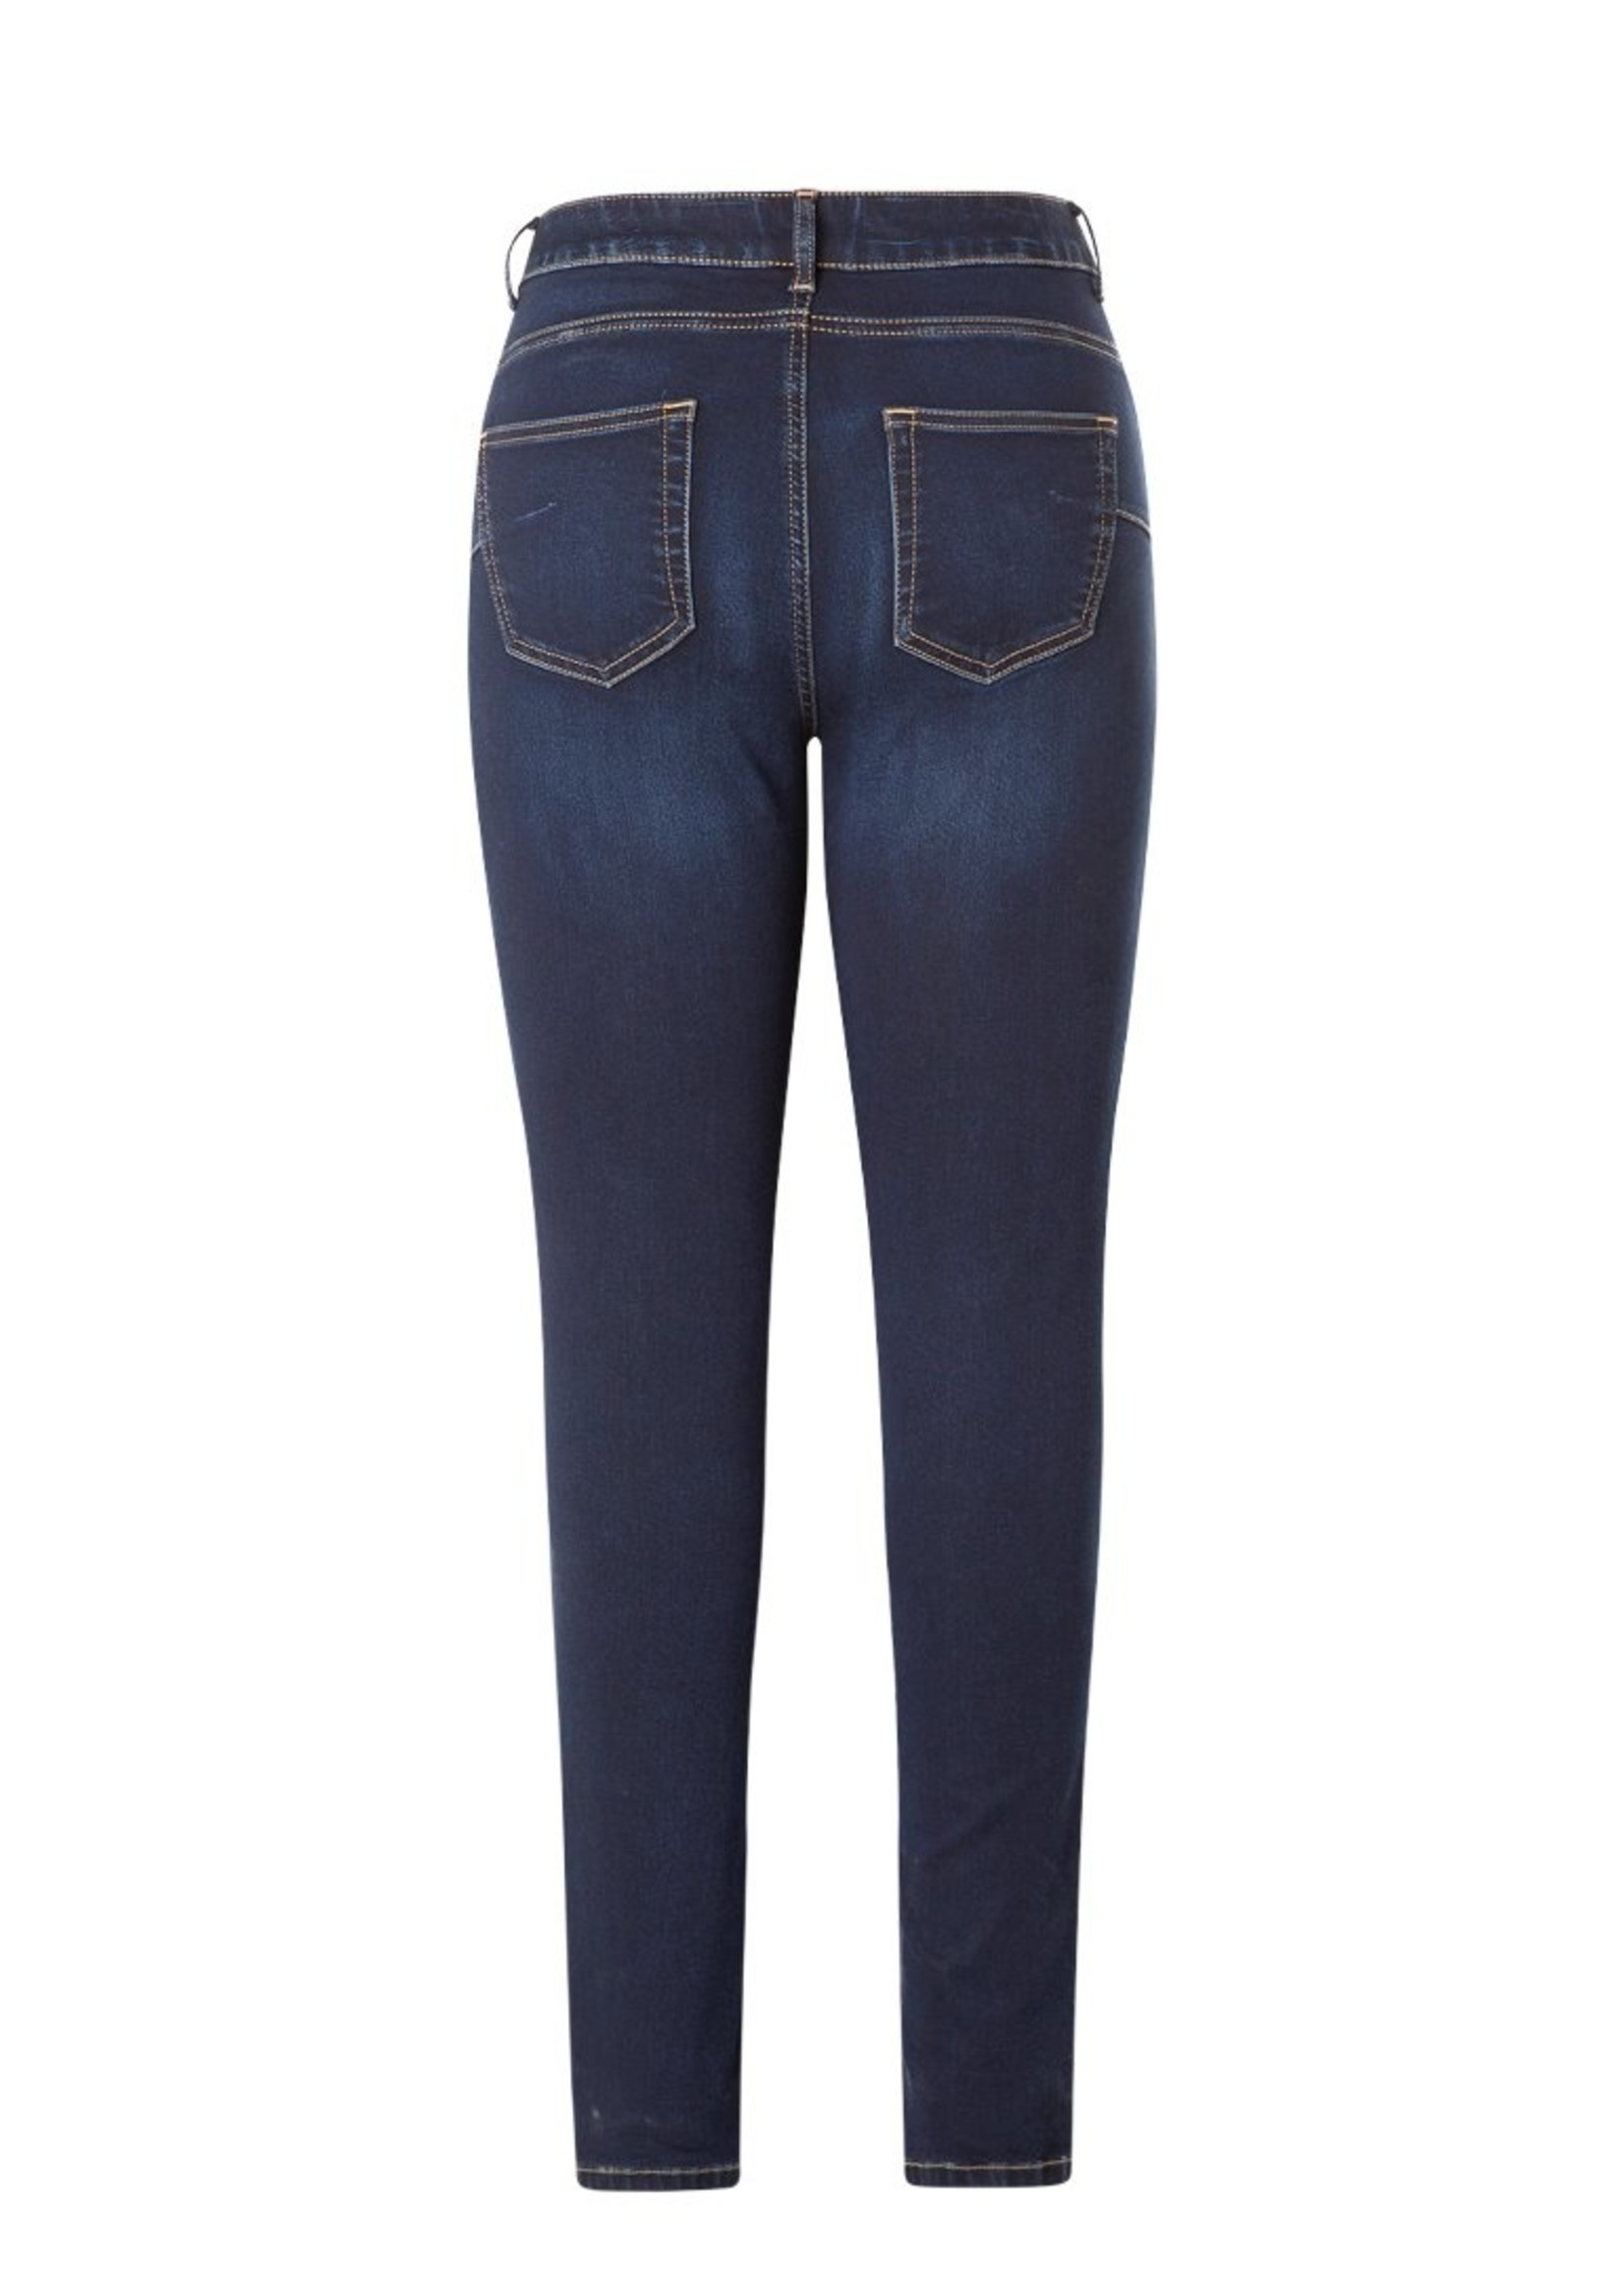 Yest Yest Joy Jeans